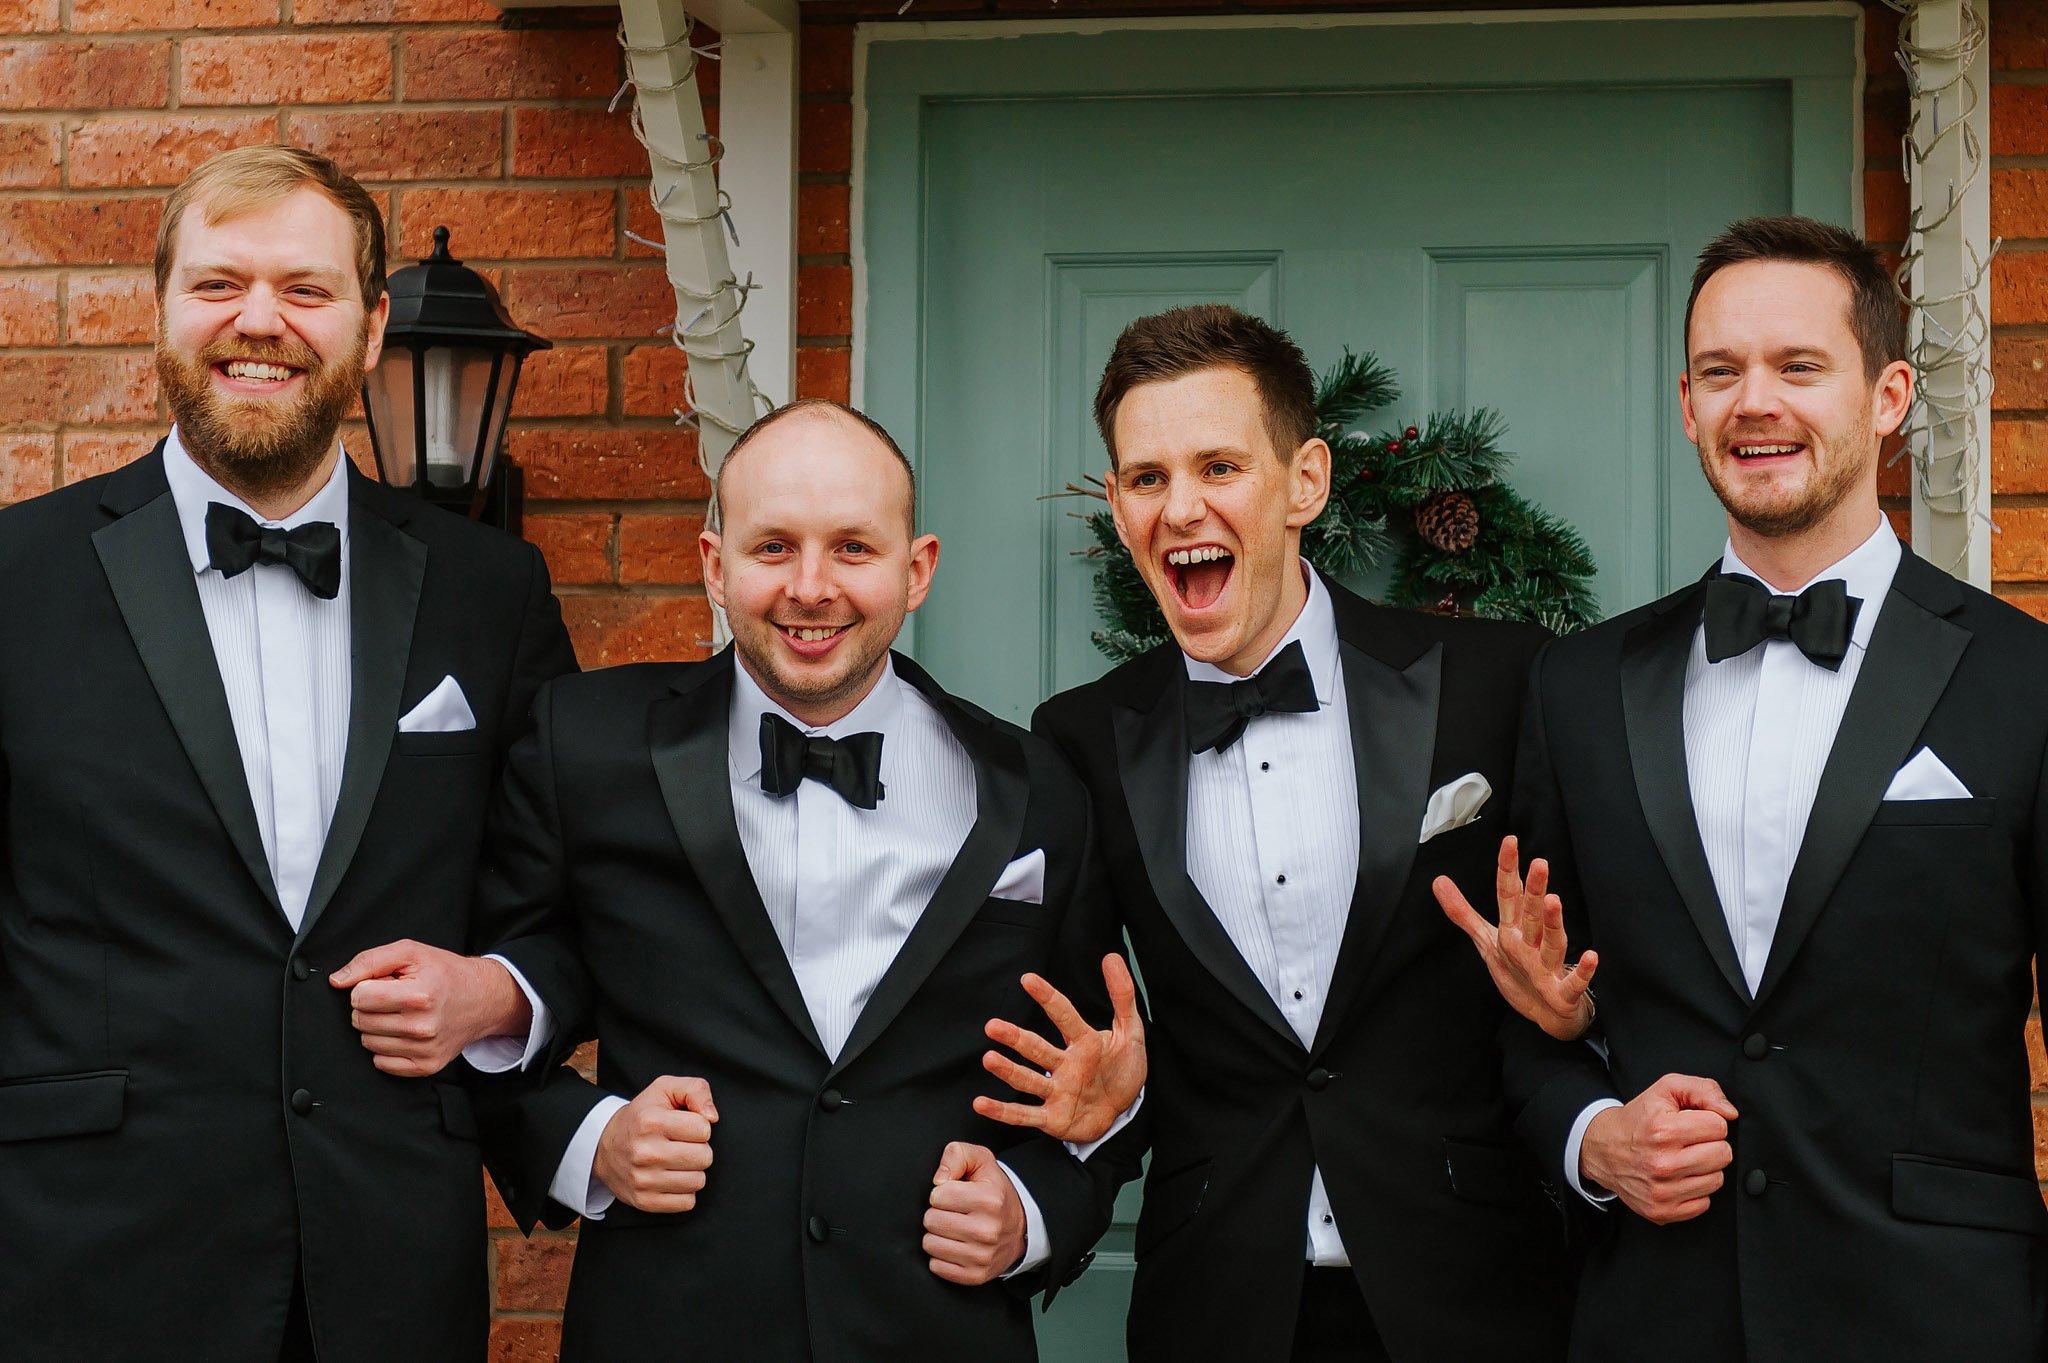 Coombe Abbey wedding in Coventry, Warwickshire - Sam + Matt 8